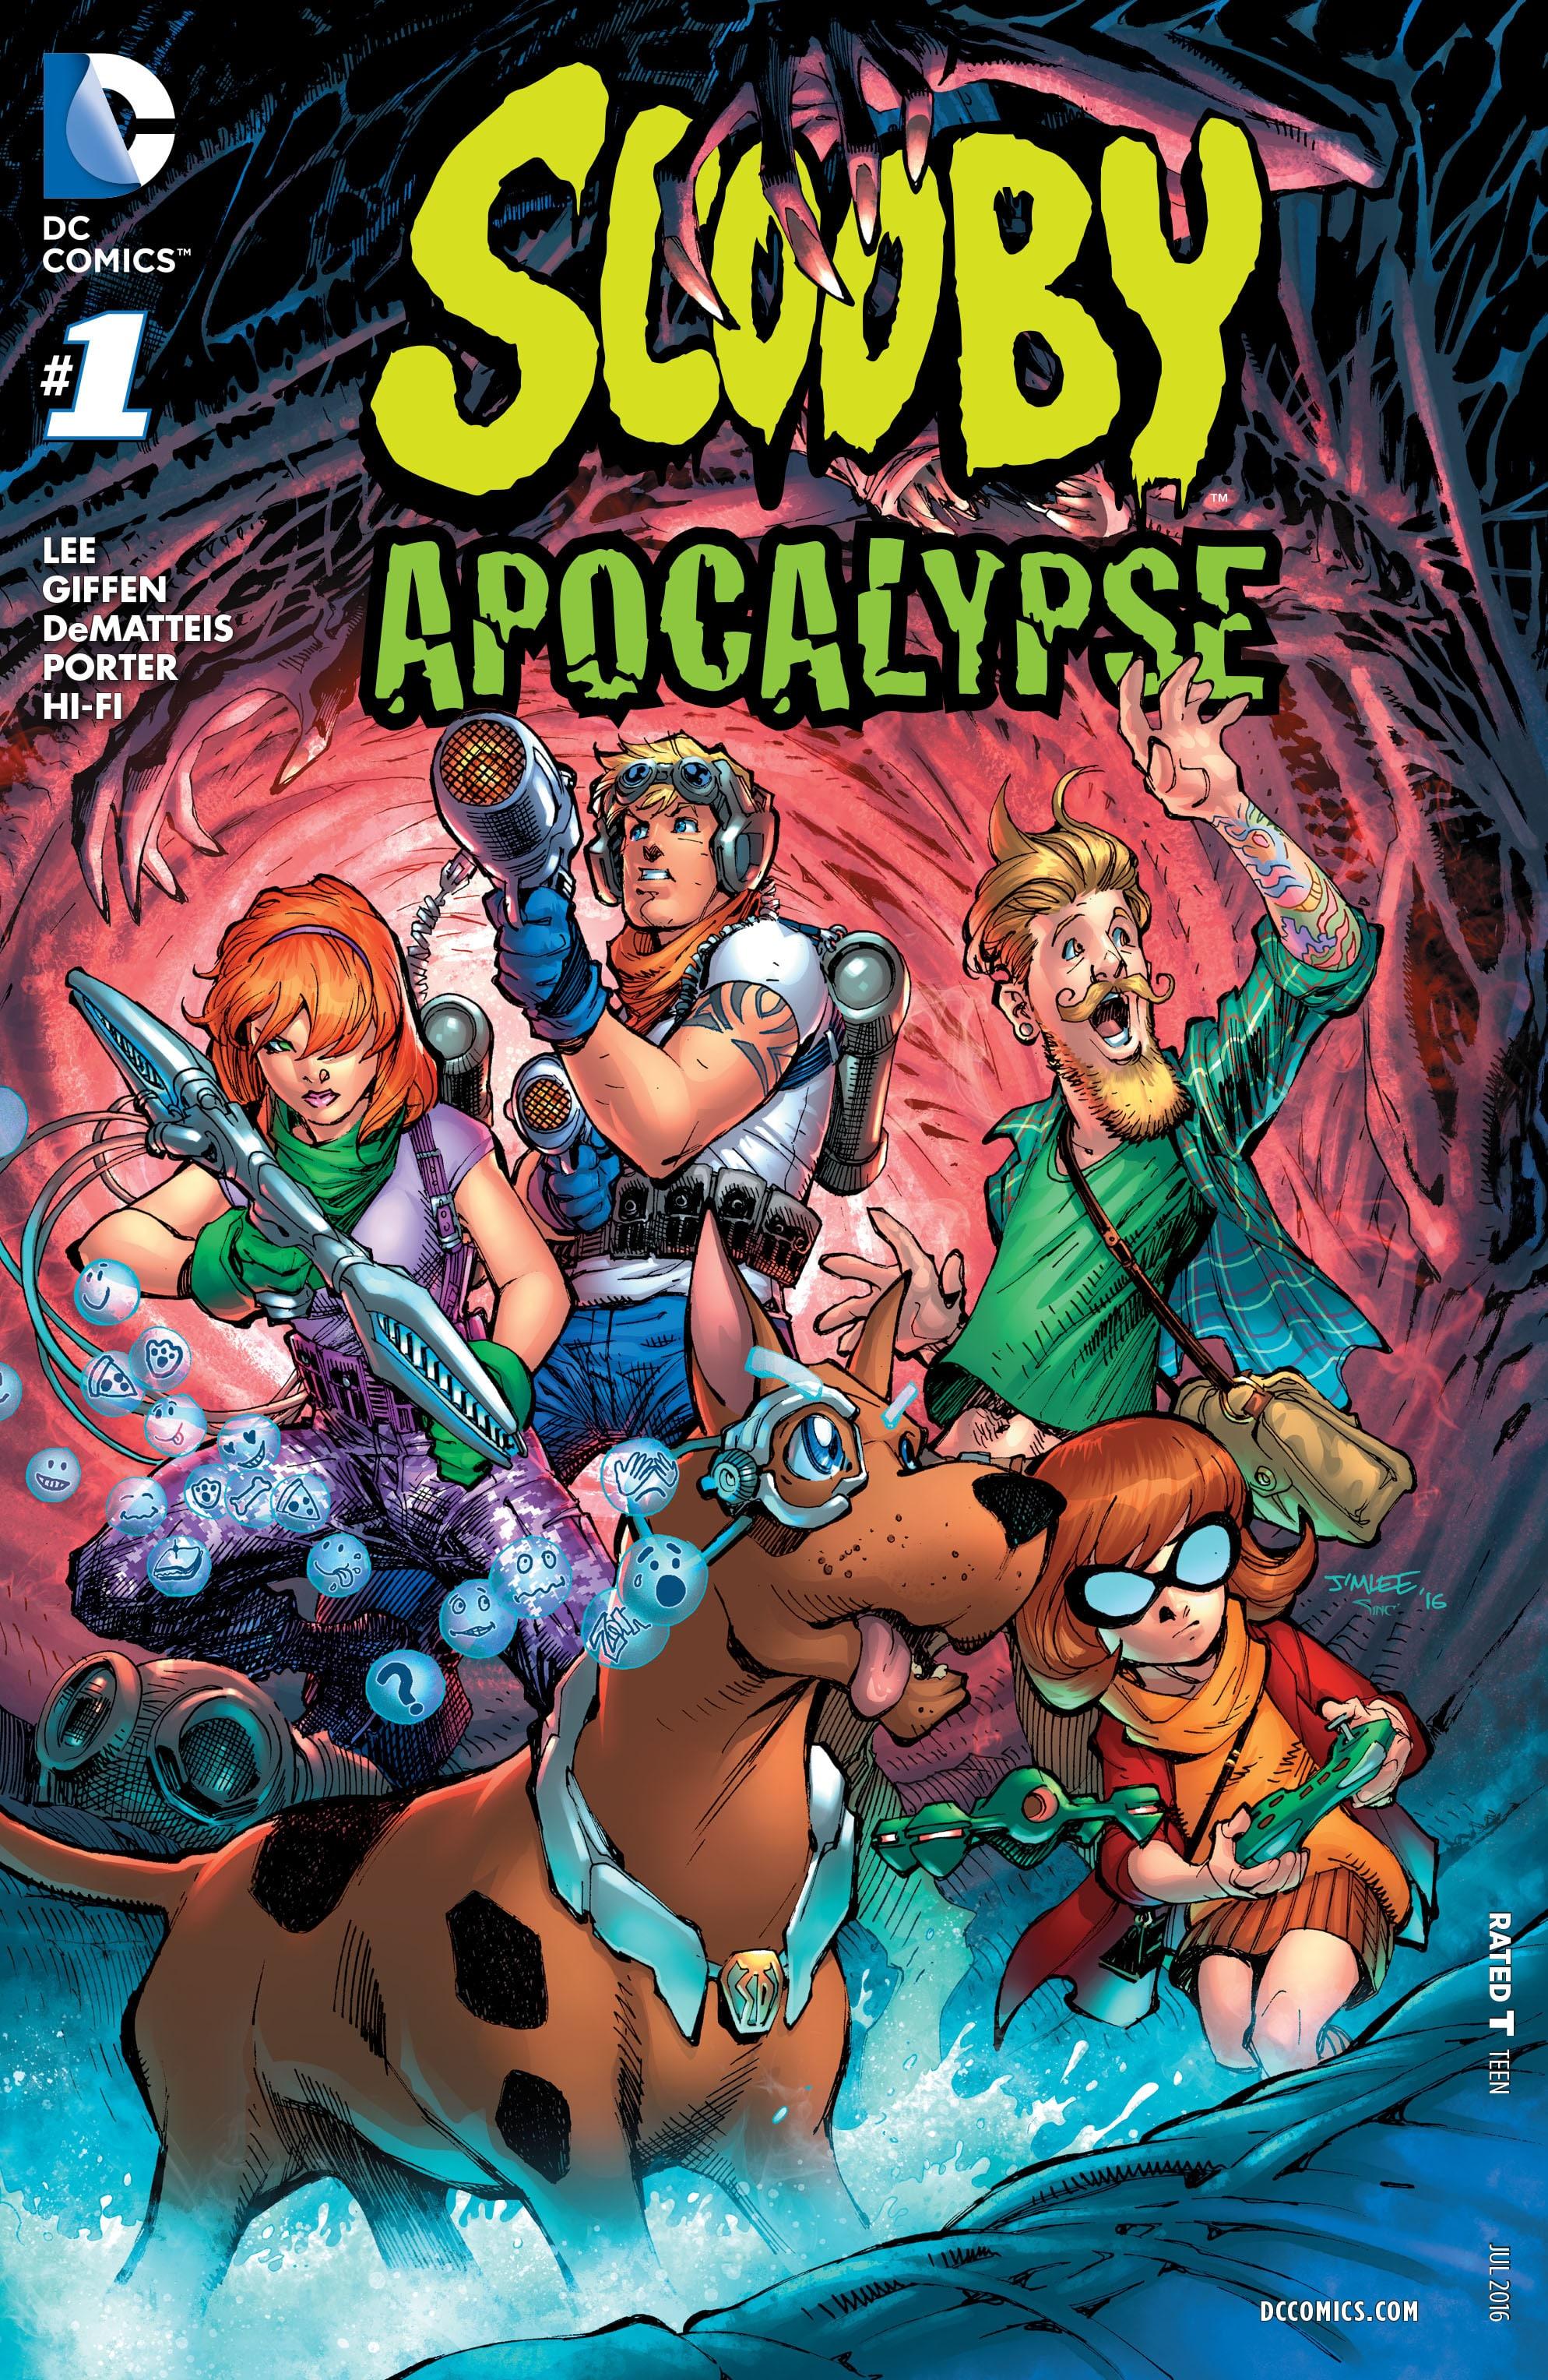 http://www.dcplanet.fr/wp-content/uploads/2016/05/Scooby-Apocalypse-2016-001-000.jpg